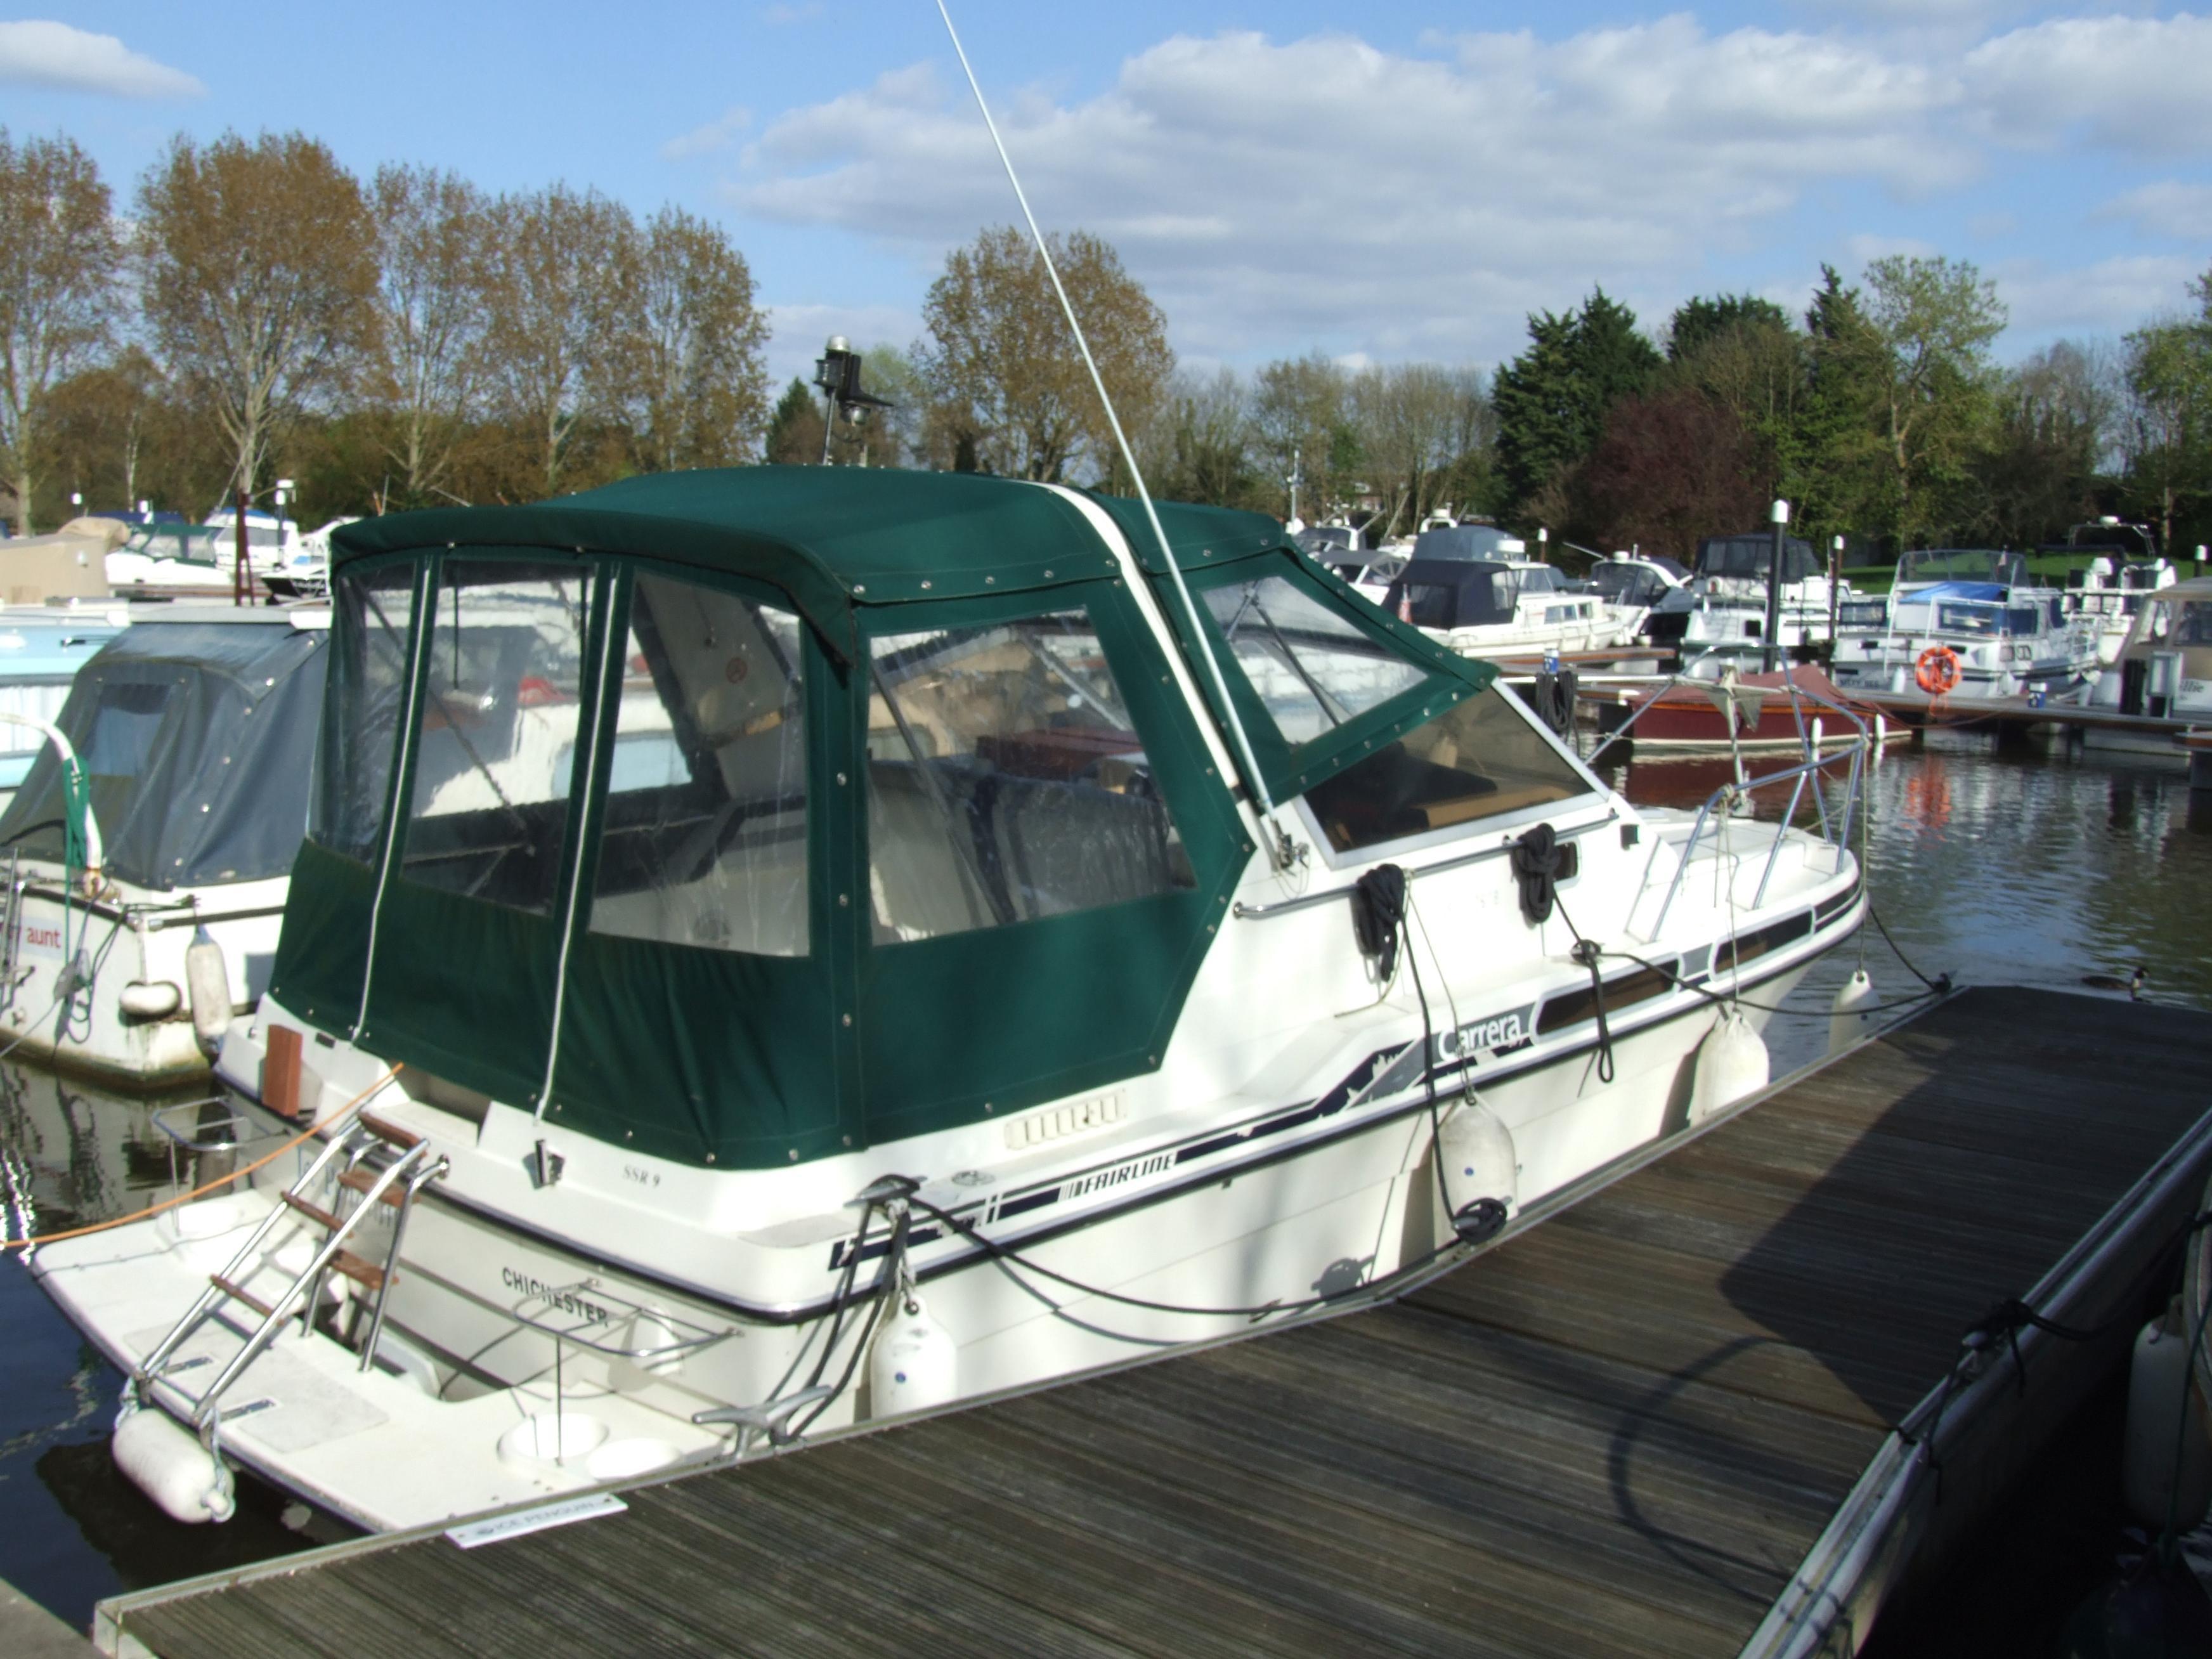 Fairline Boats PLC Carrera 24, S/O, Shepperton Marina